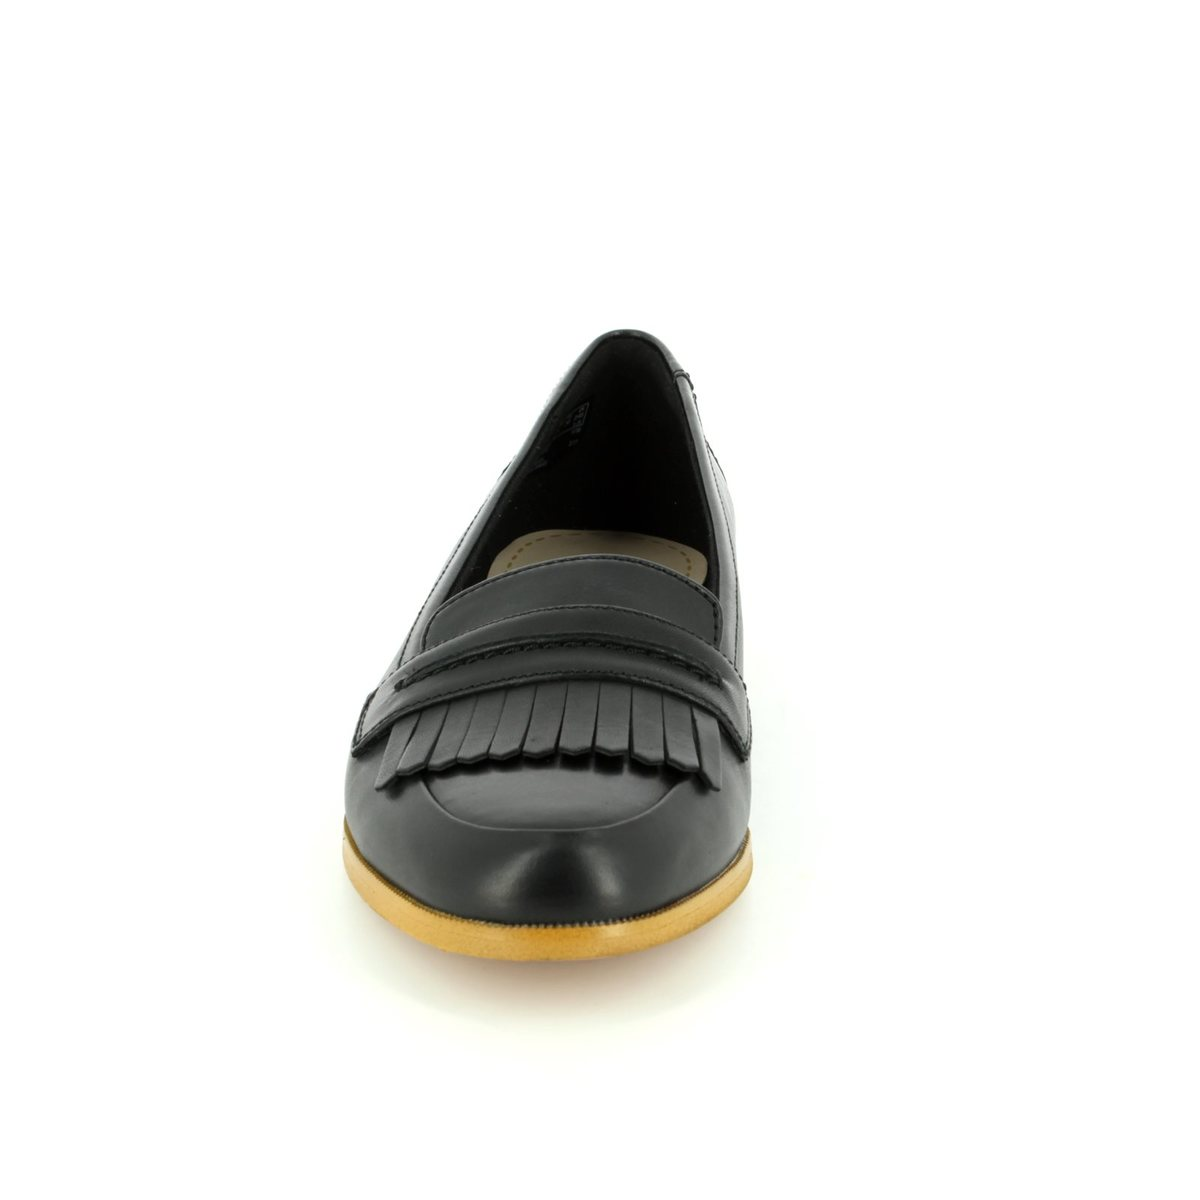 Clarks Andora Crush D Fit Black Loafers Island Shoes Slip On Mocasine Casual 2715 44d